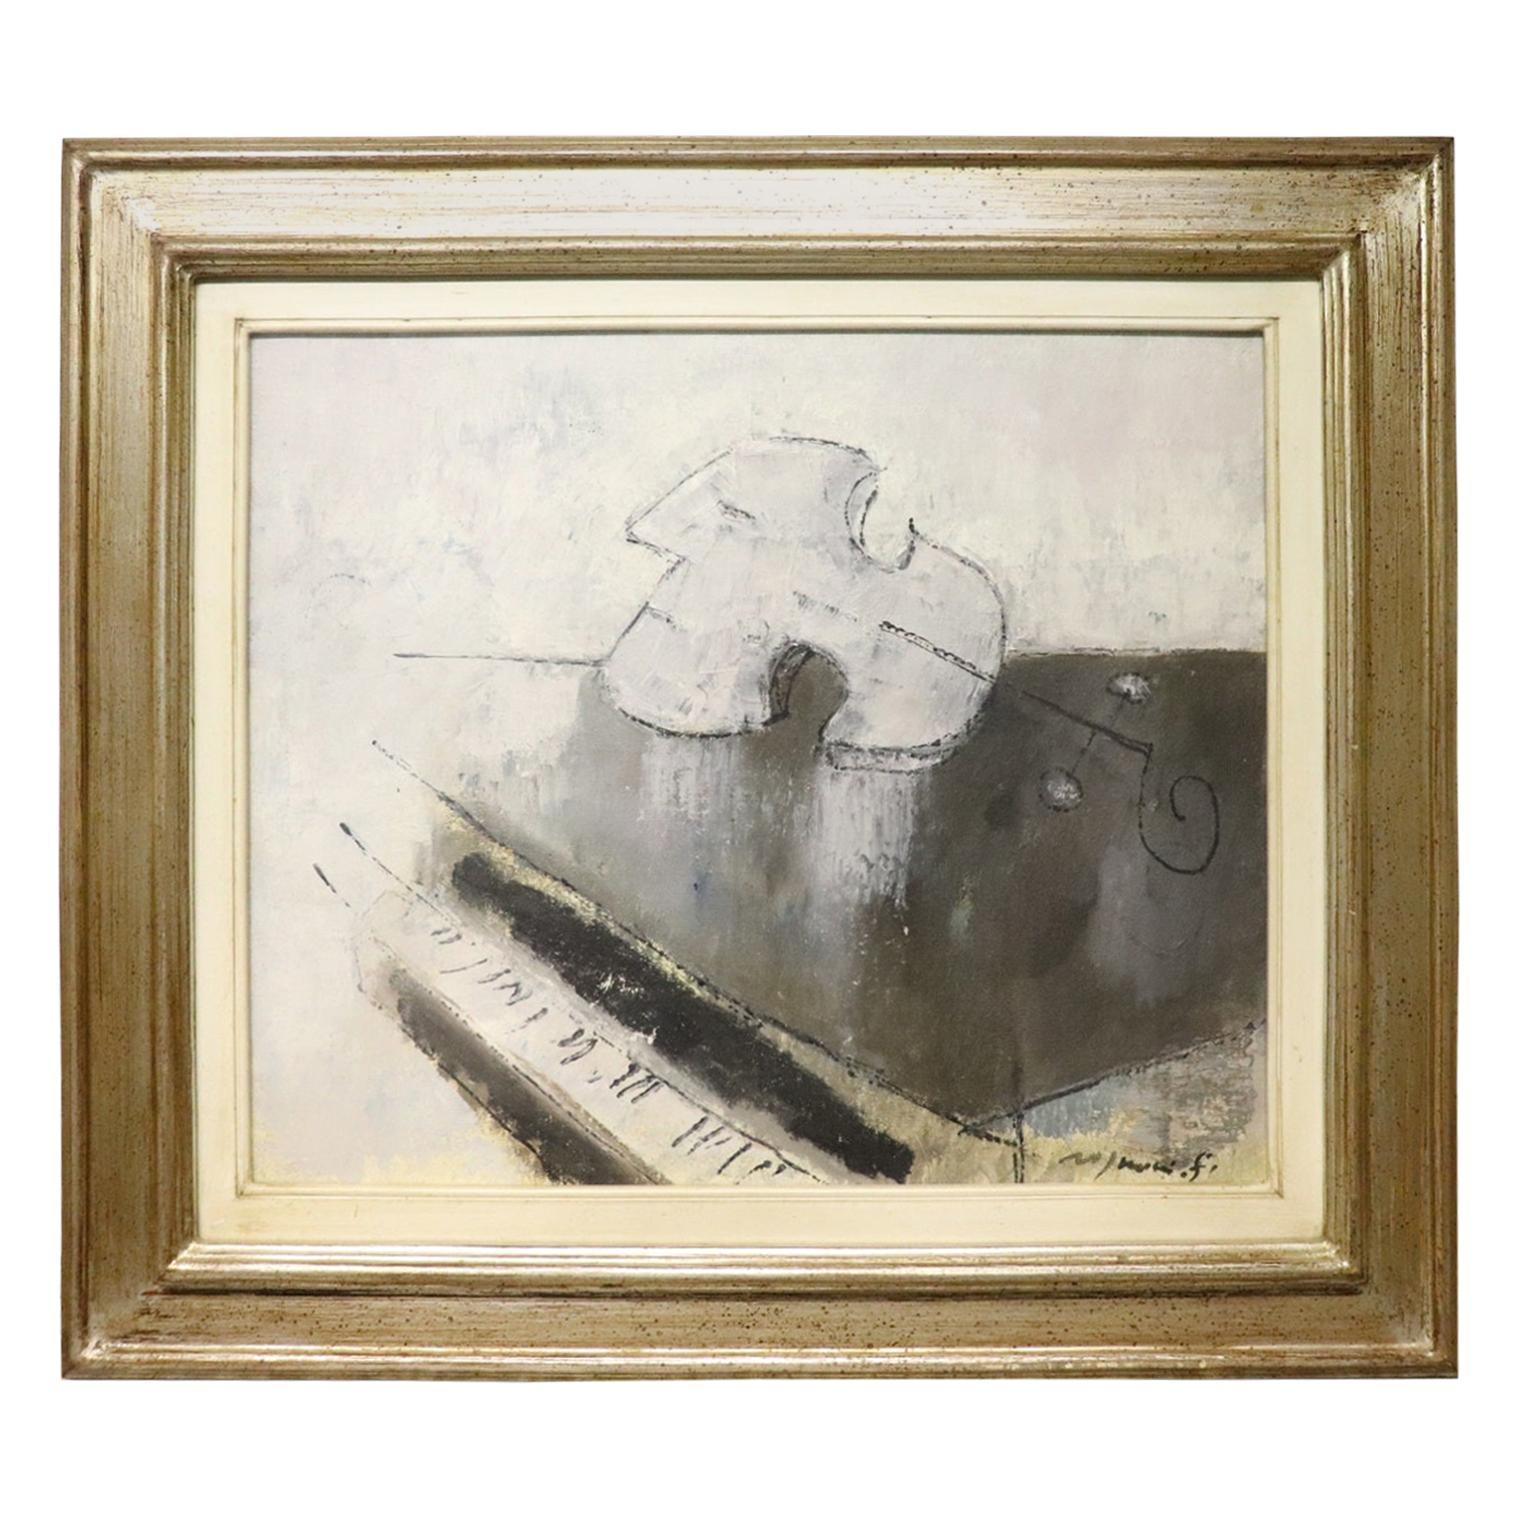 20th Century Important Italian Artist Oil on Canvas by Franco Rognoni